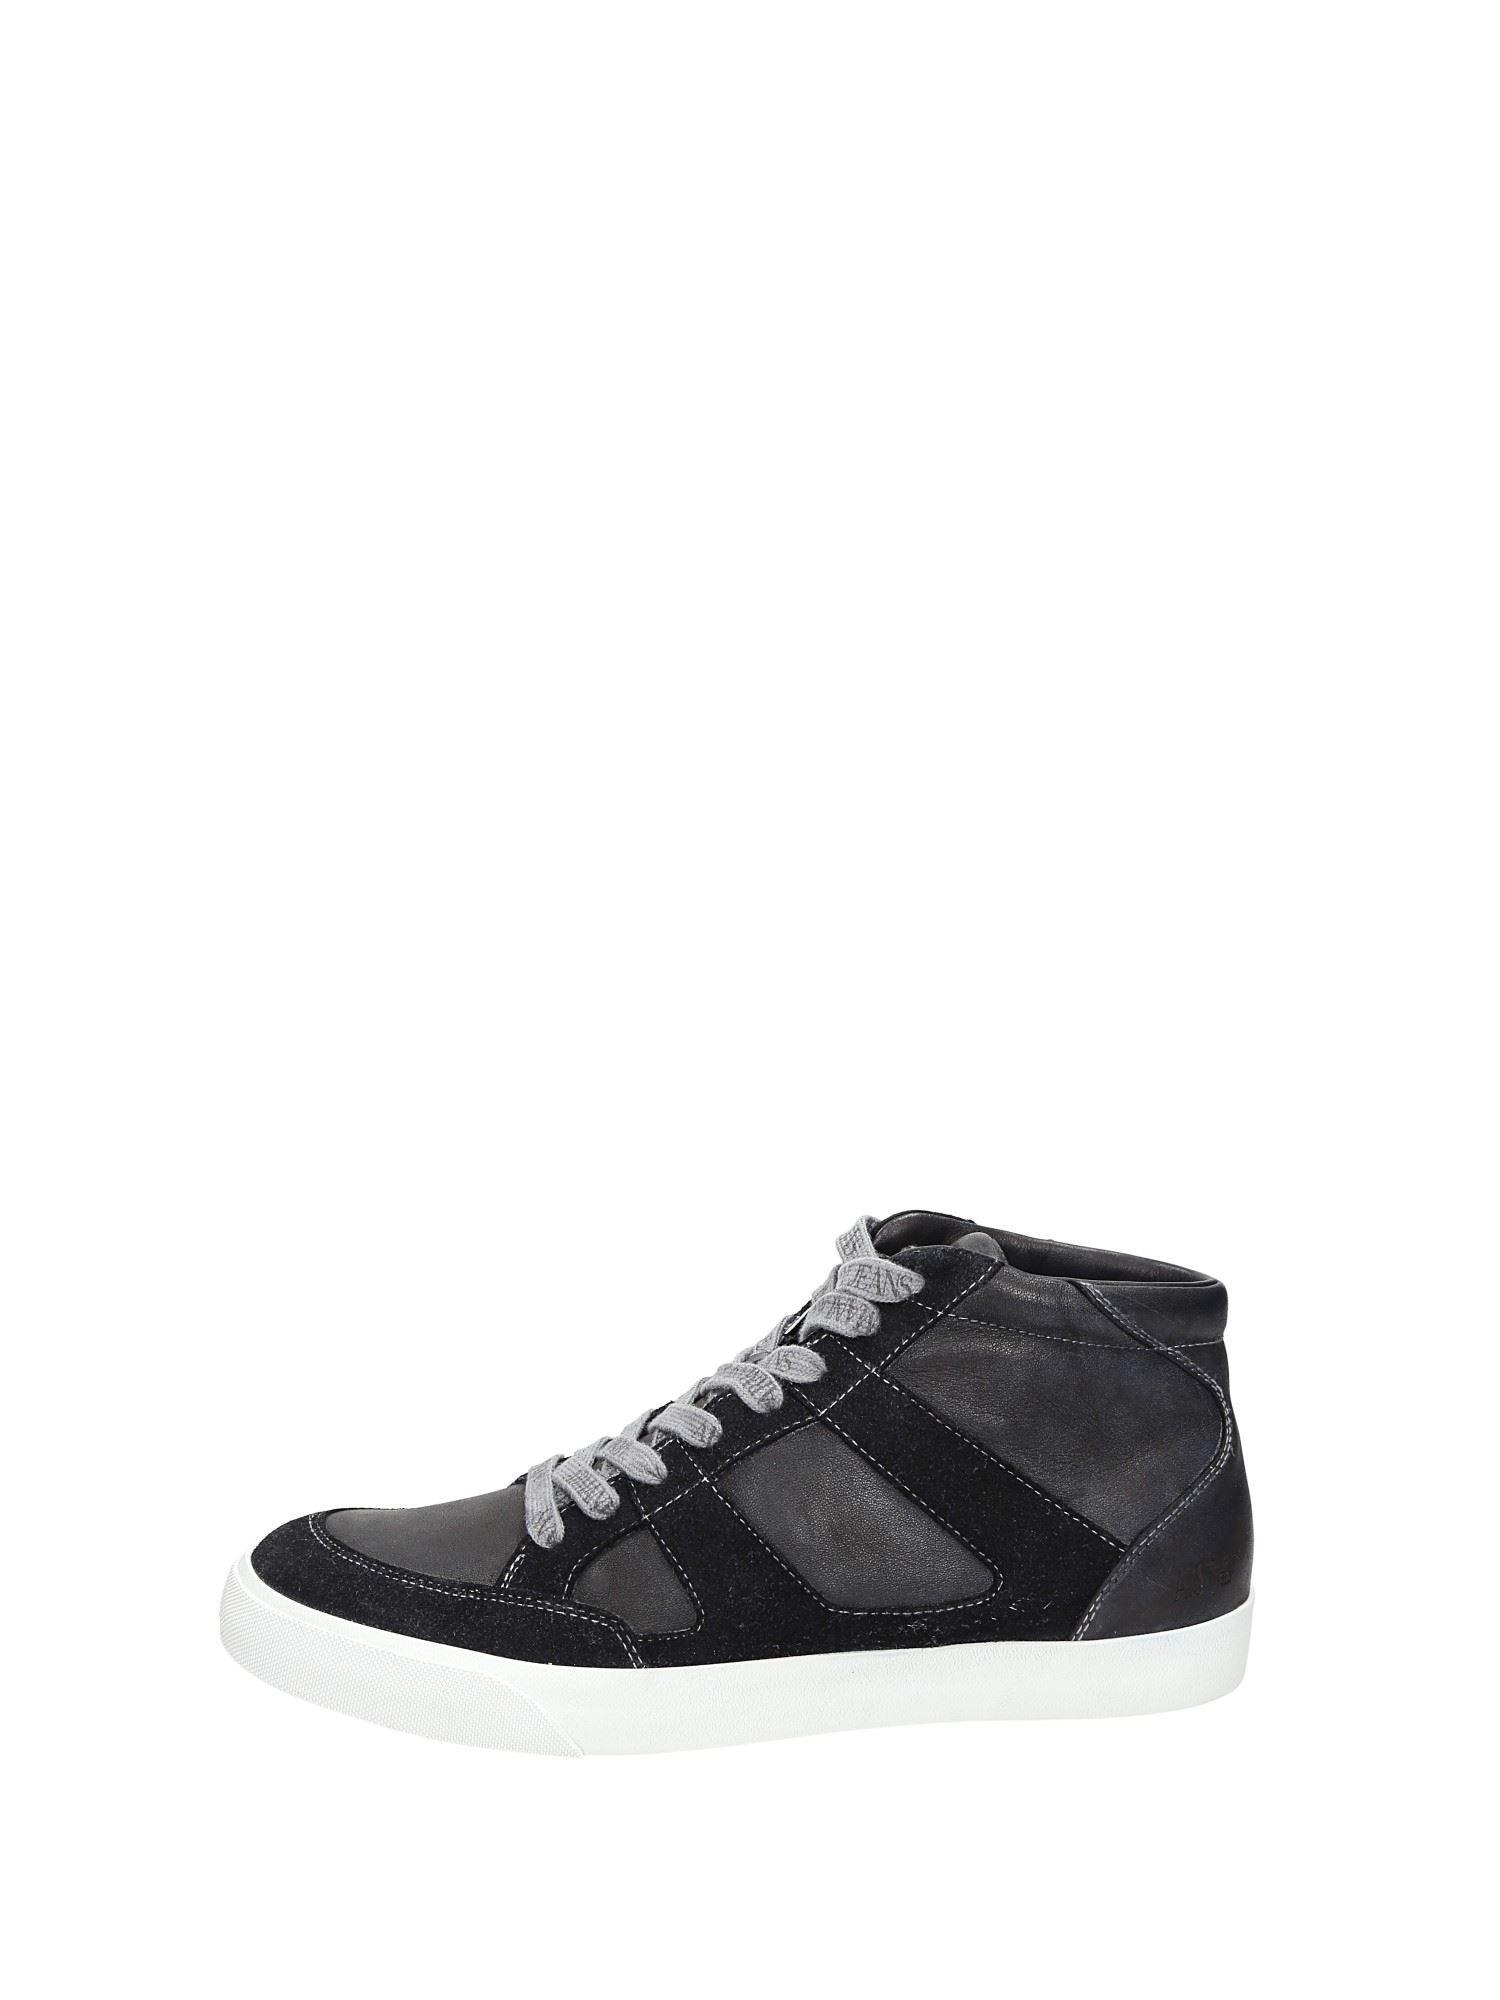 Armani Jeans B6531 Blu Scarpe Uomo Sneakers 8d093fdb03a